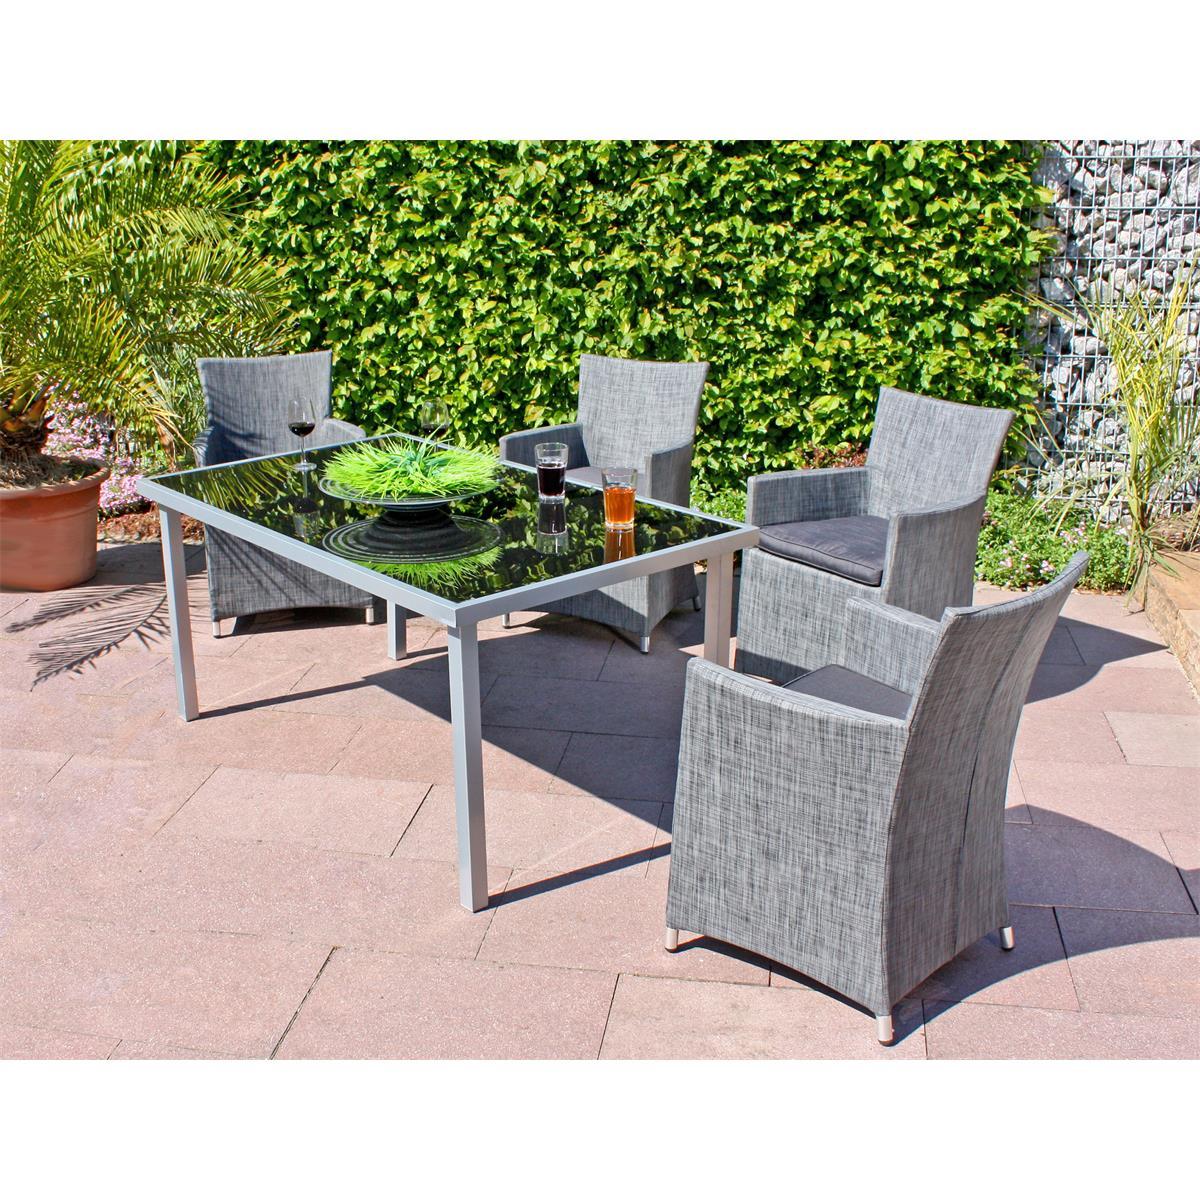 Garten sitzgruppe nola for Garten sitzgruppe